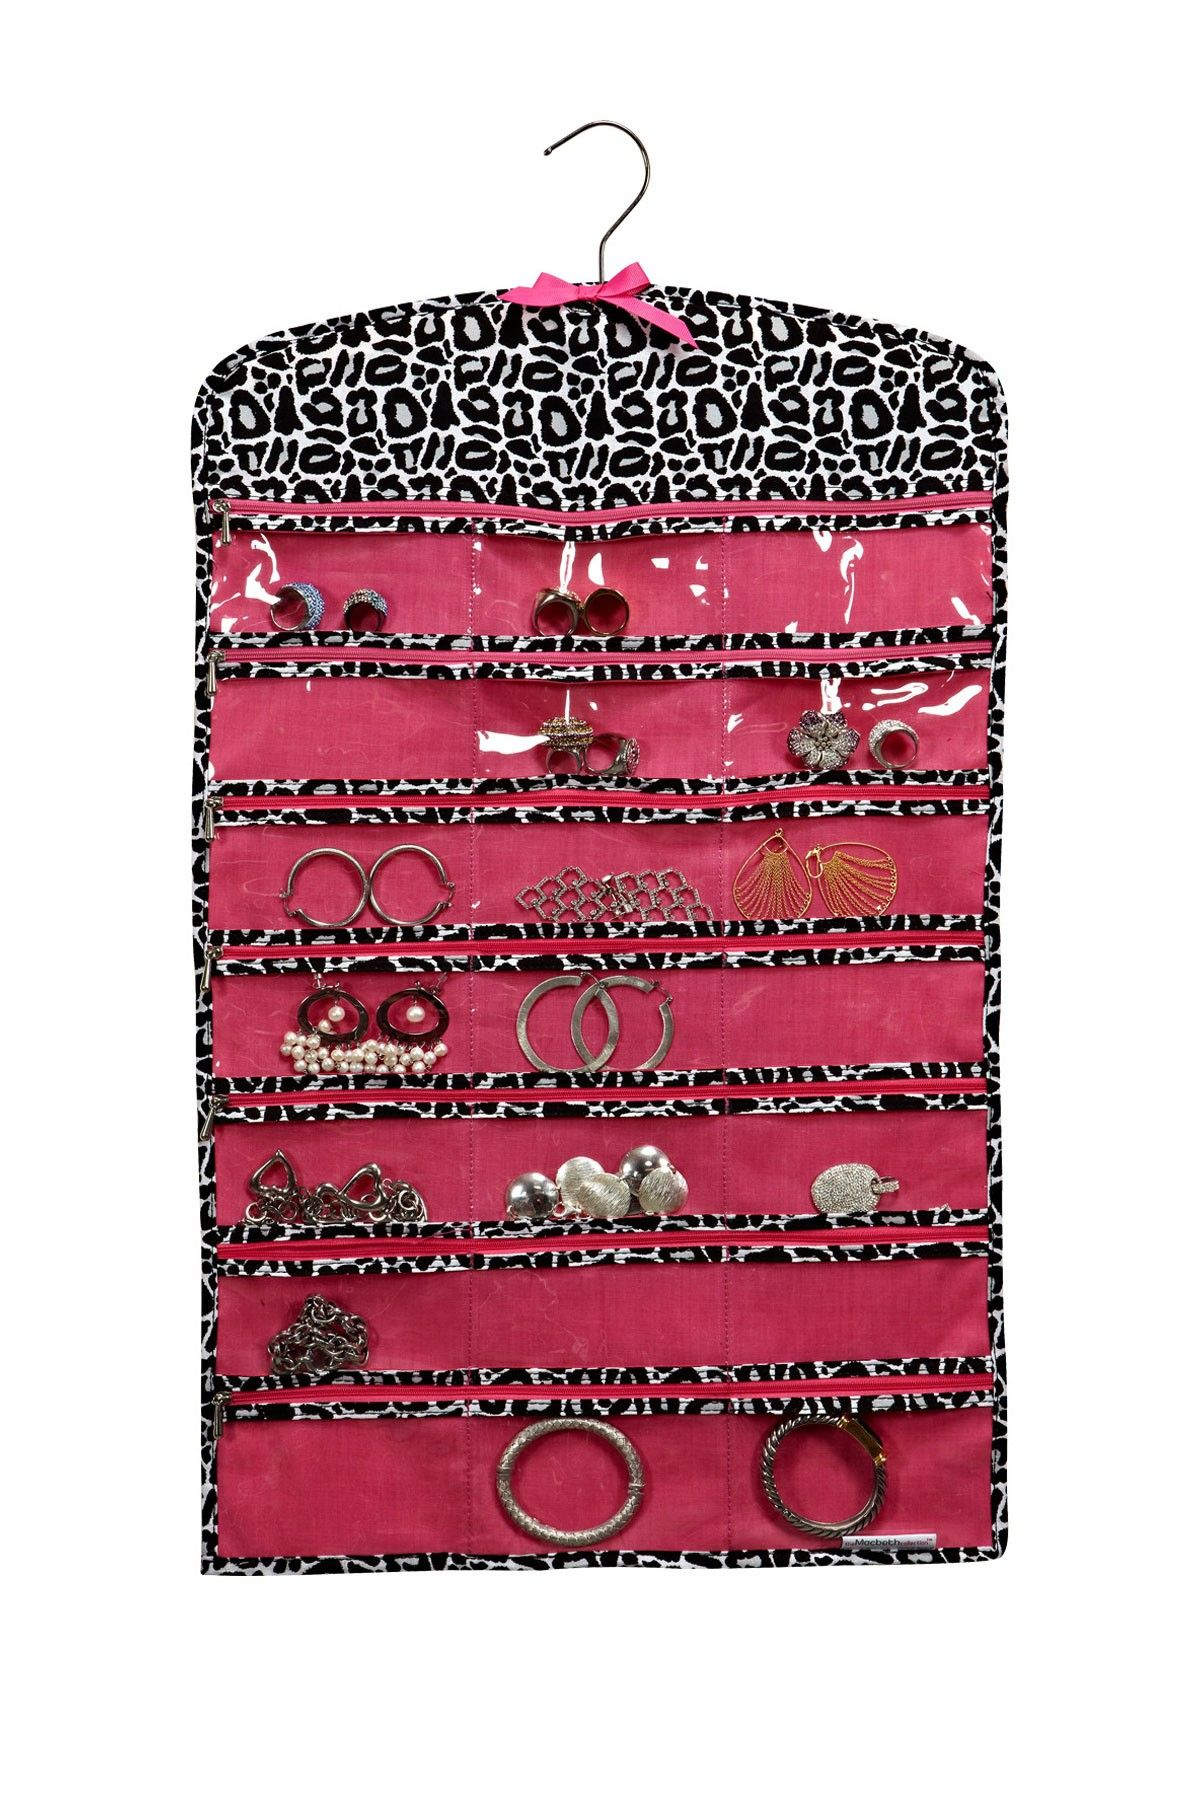 Macbeth Silver Leopard 42 Zipper Pocket Jewelry Organizer OCD